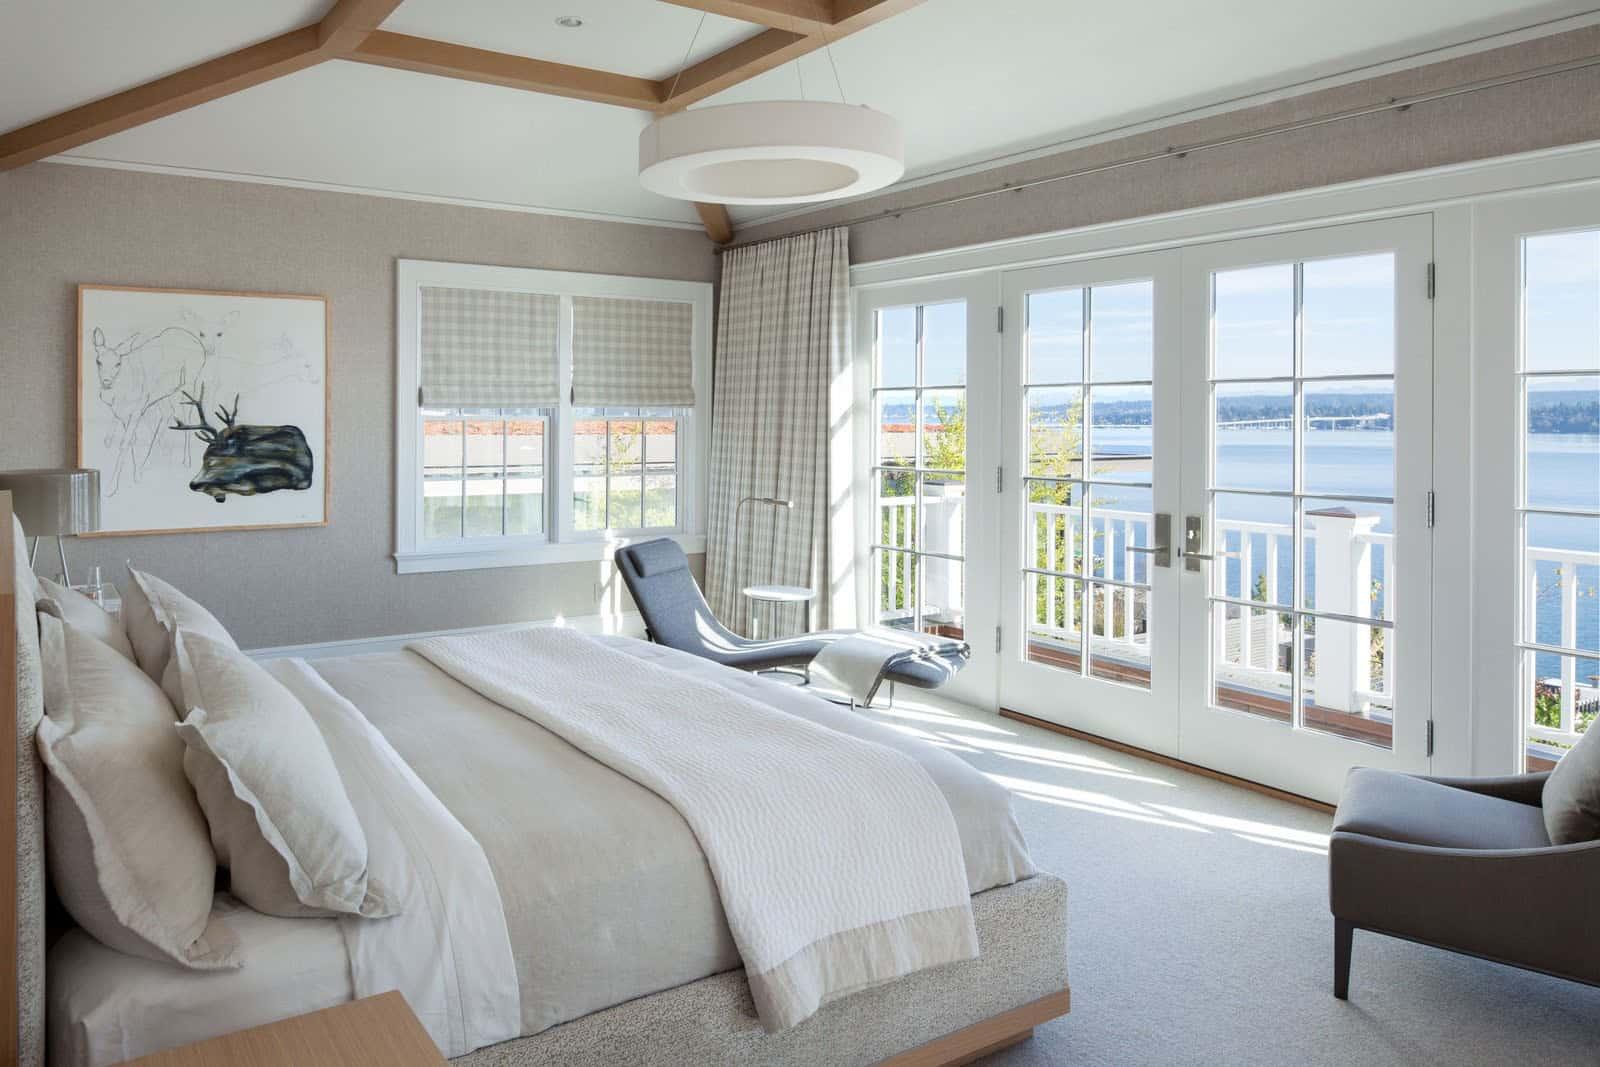 georgian-style-home-bedroom